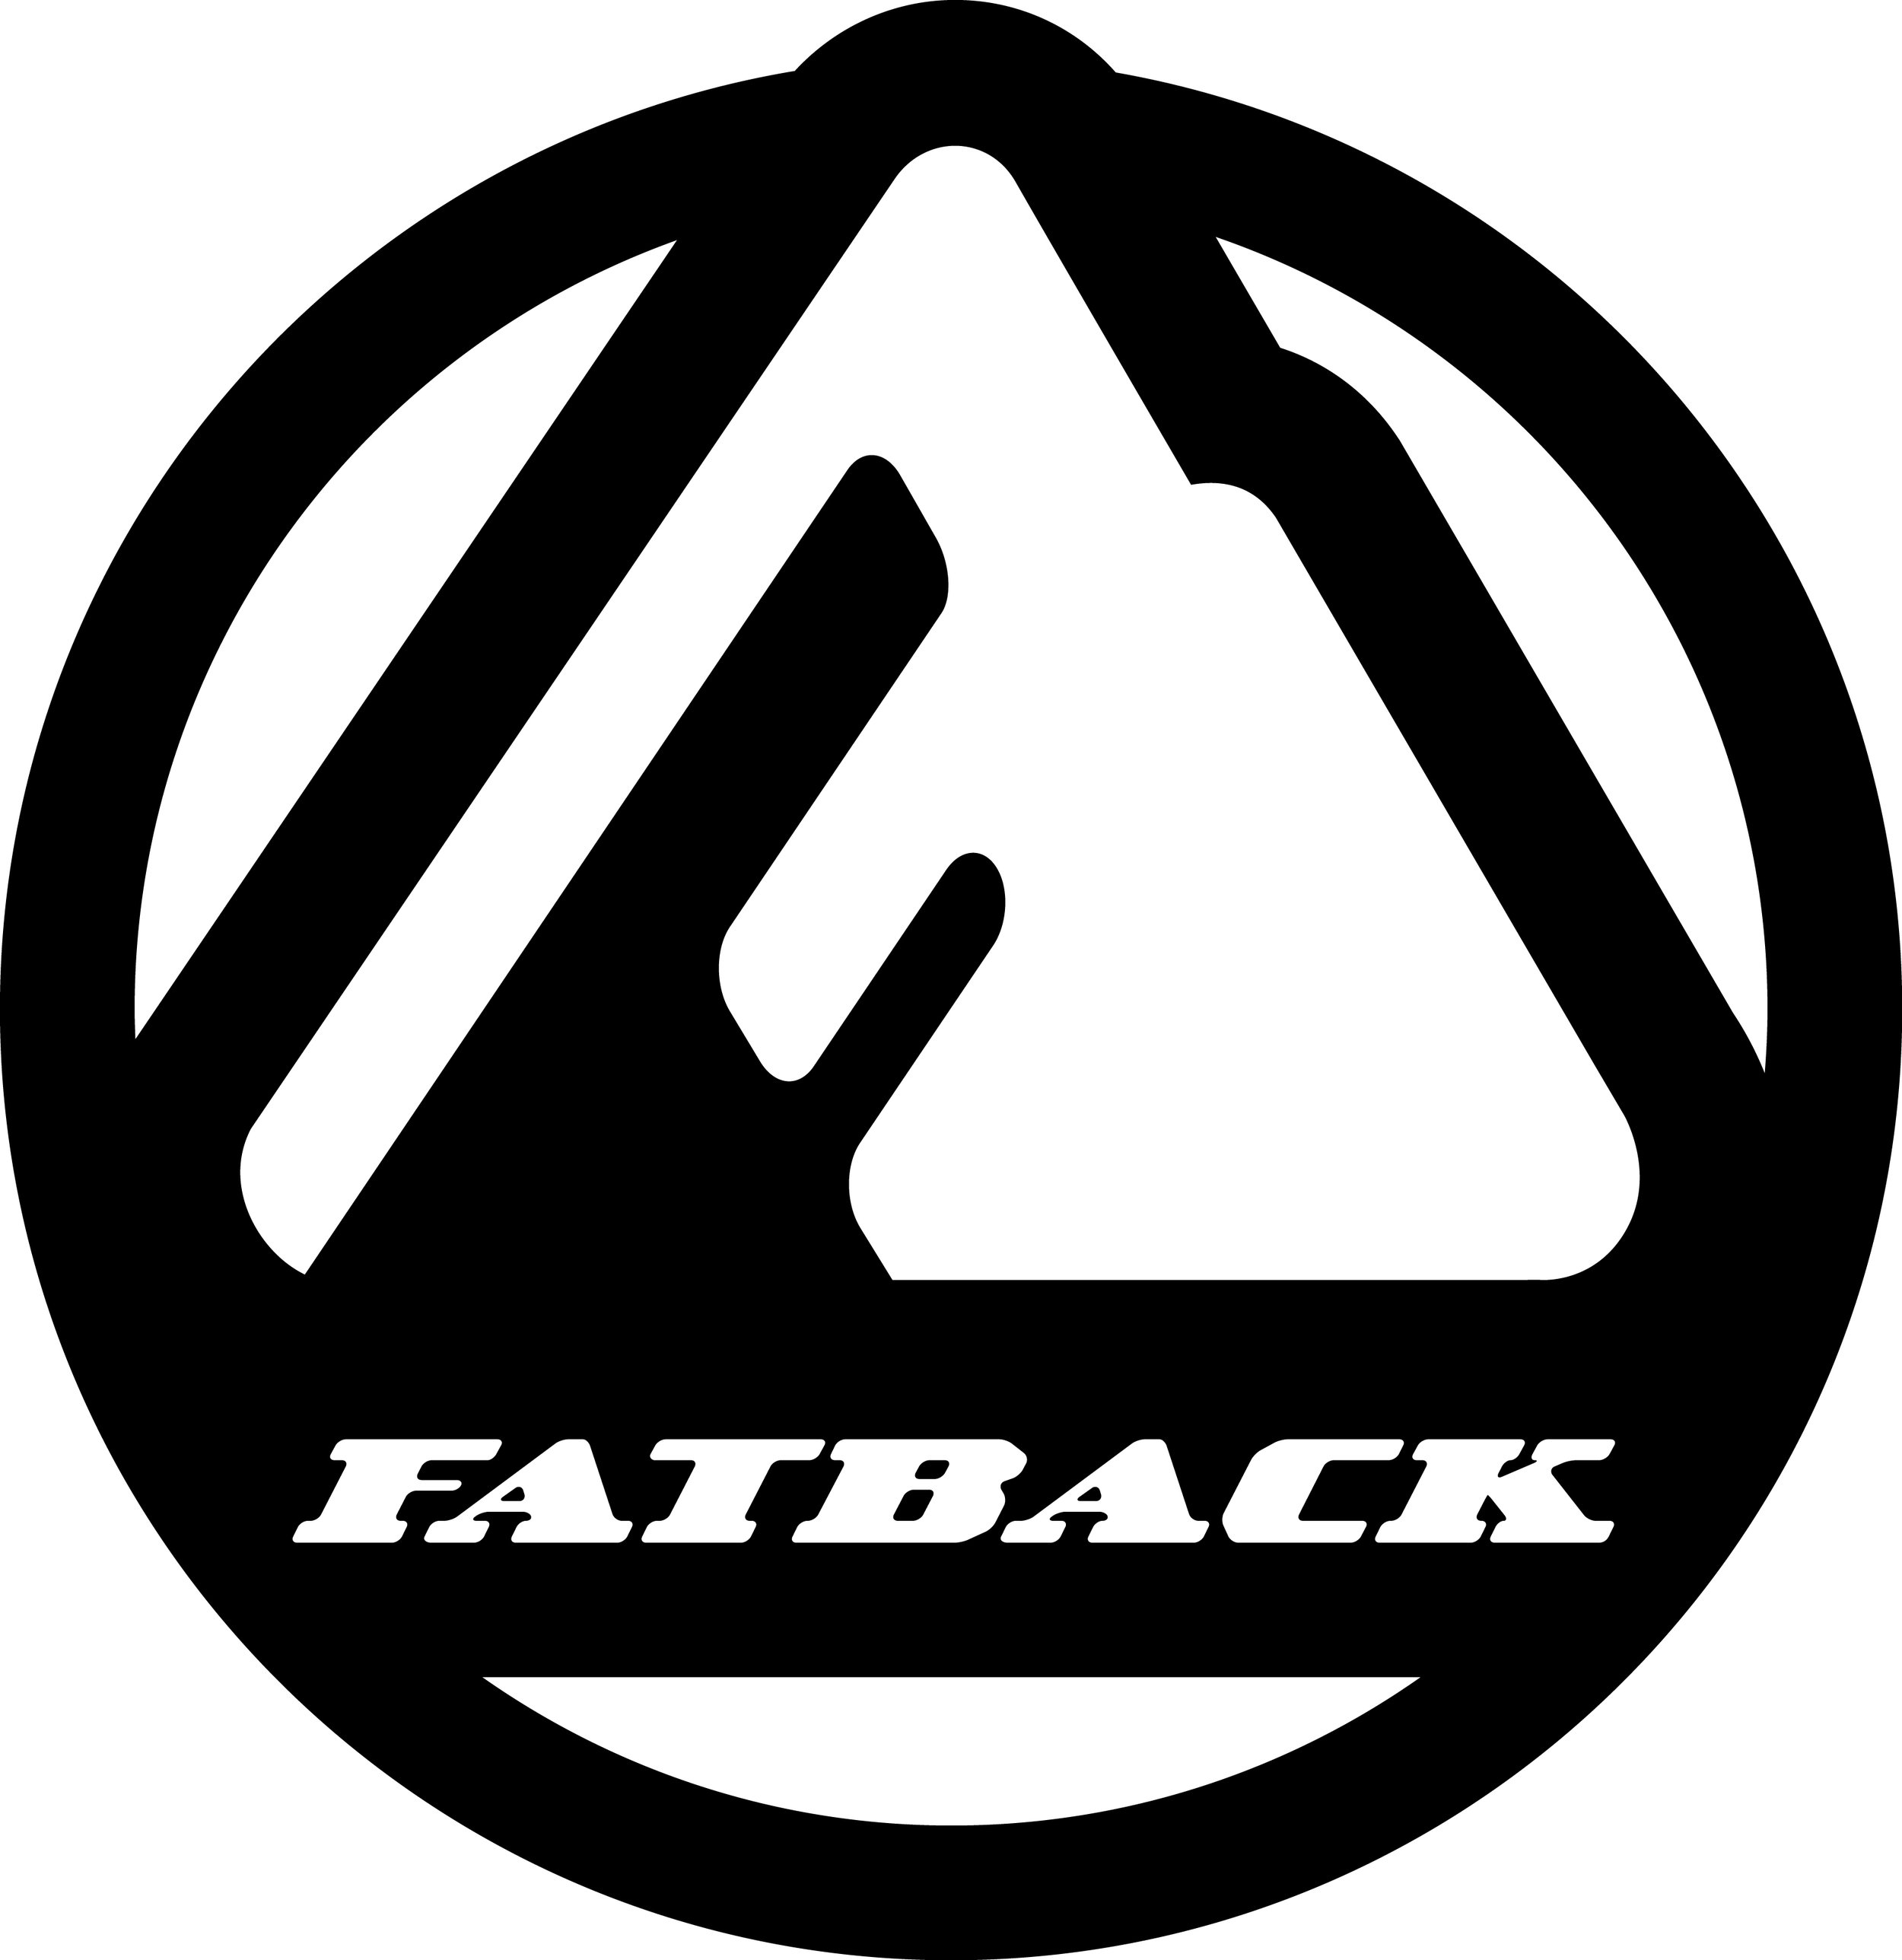 Fatback_headbadge_black.jpg